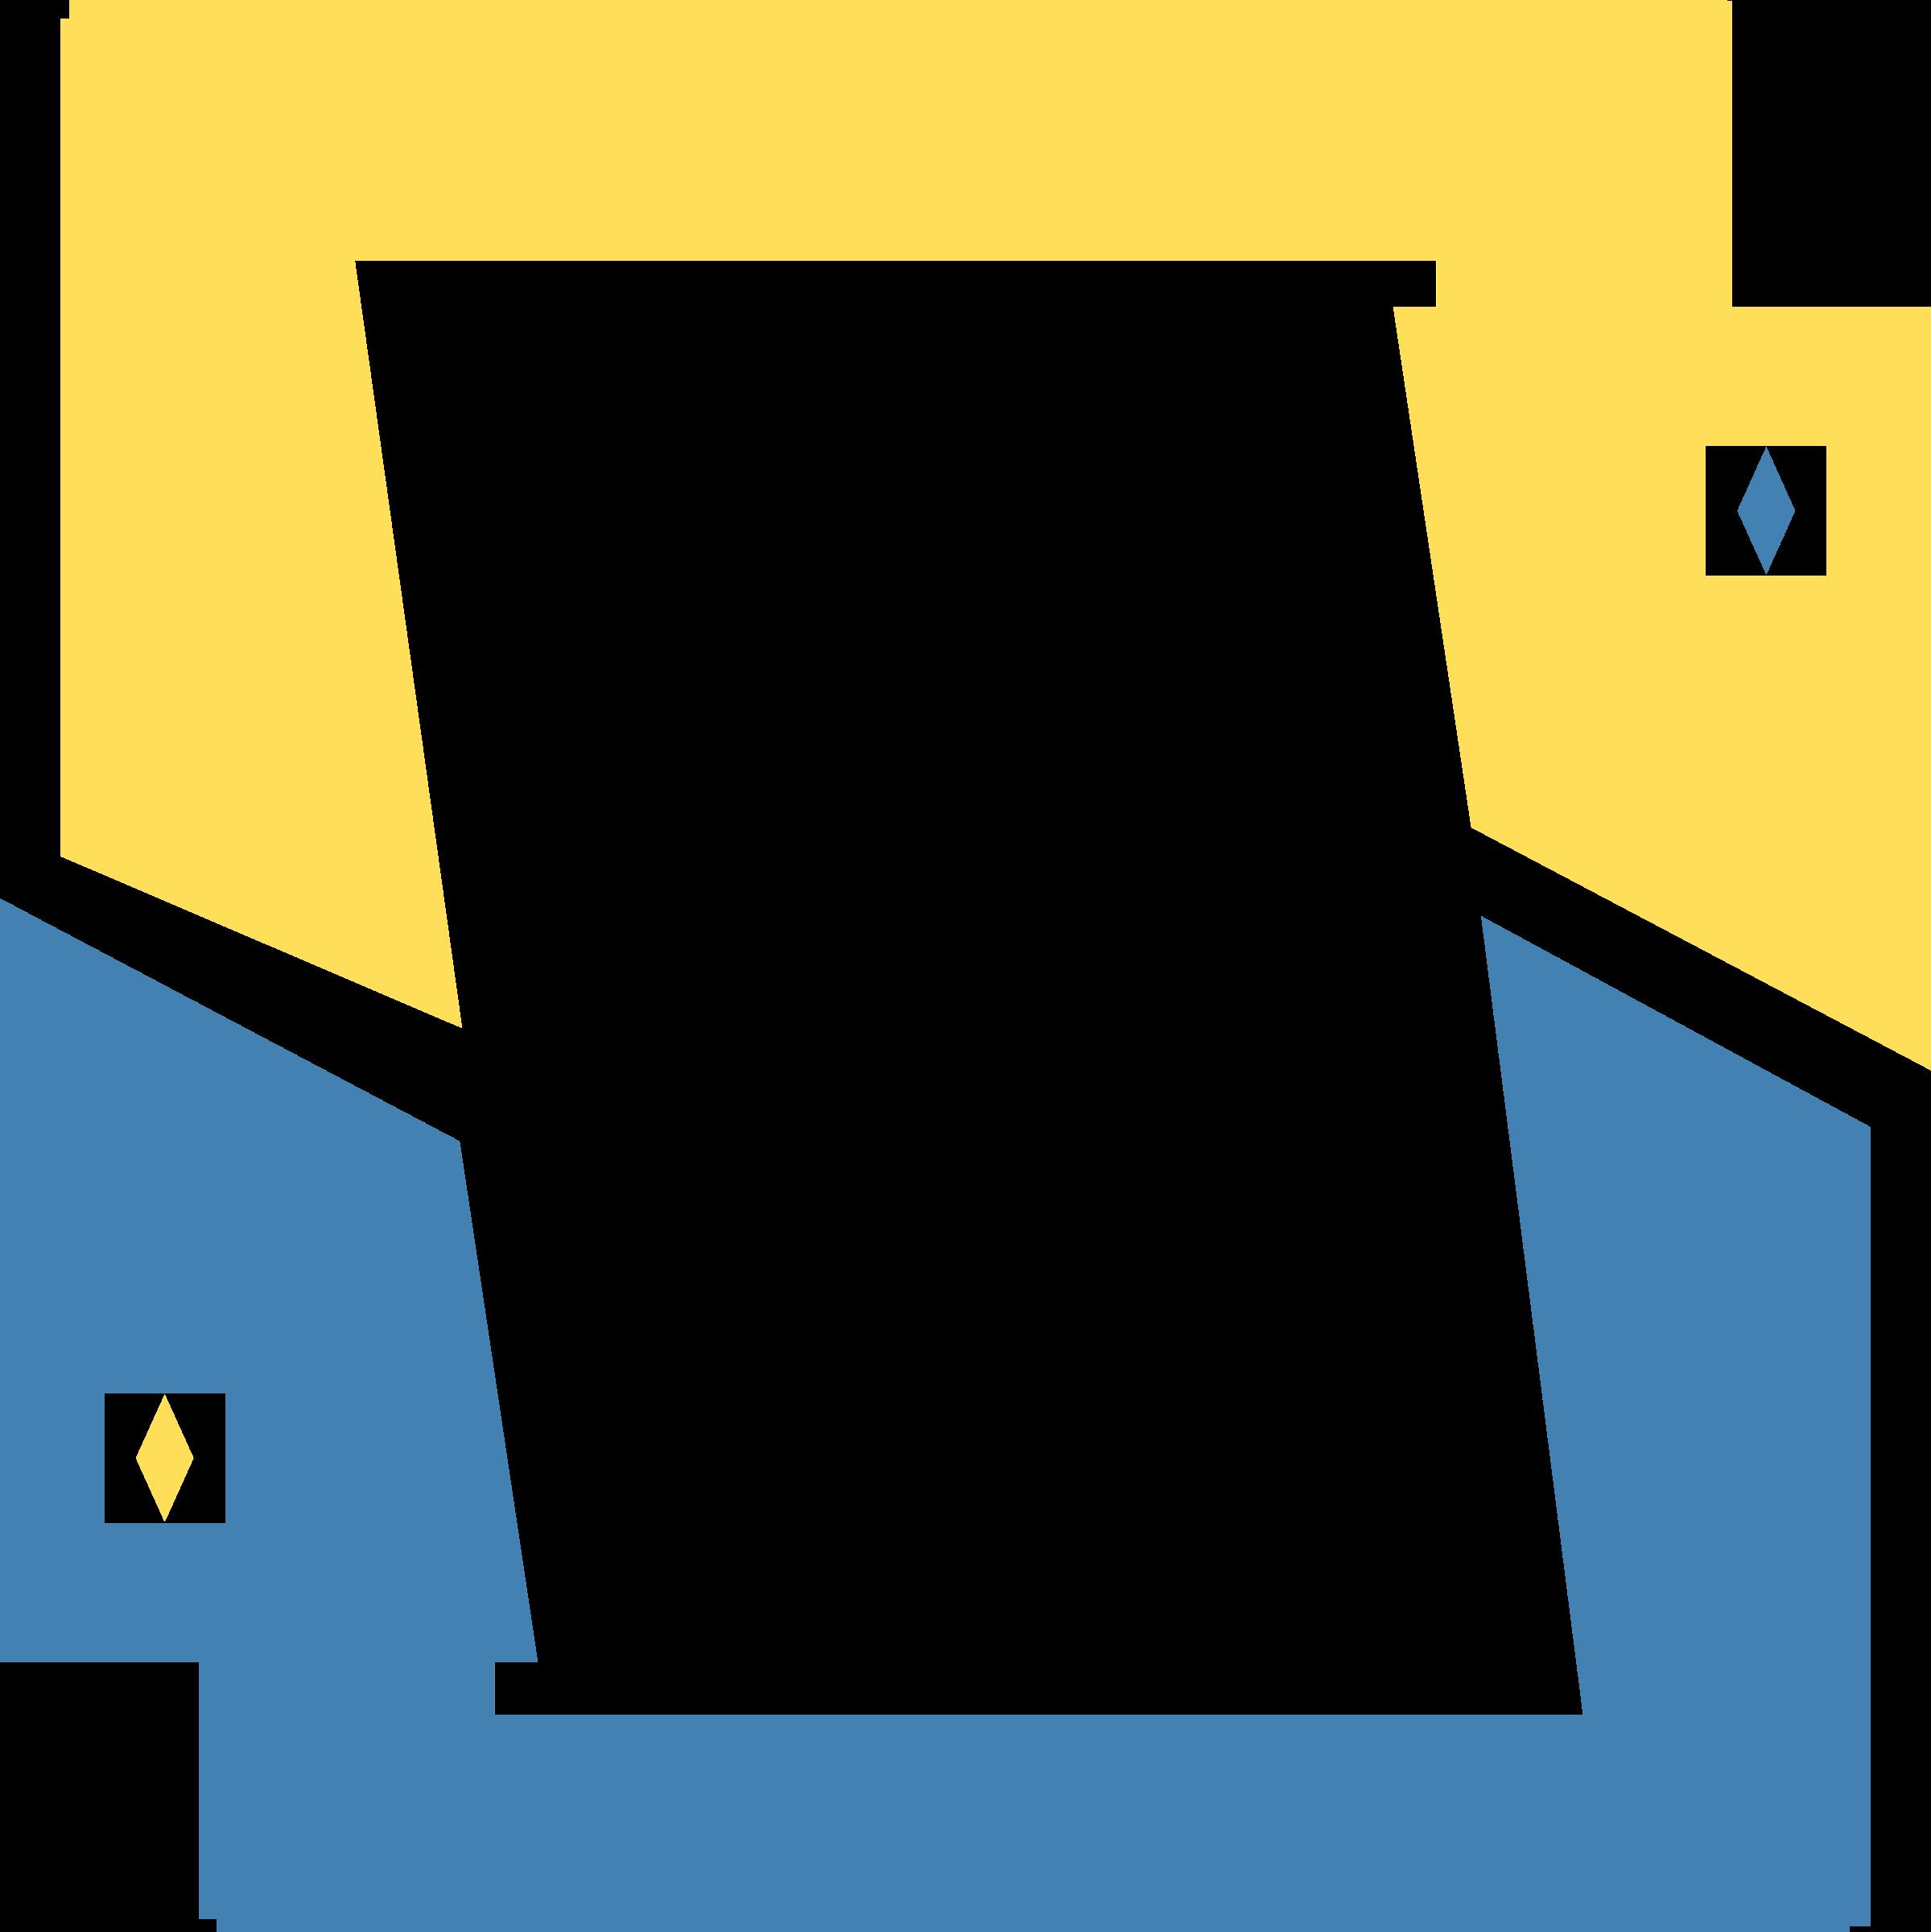 clipart python generic application logo